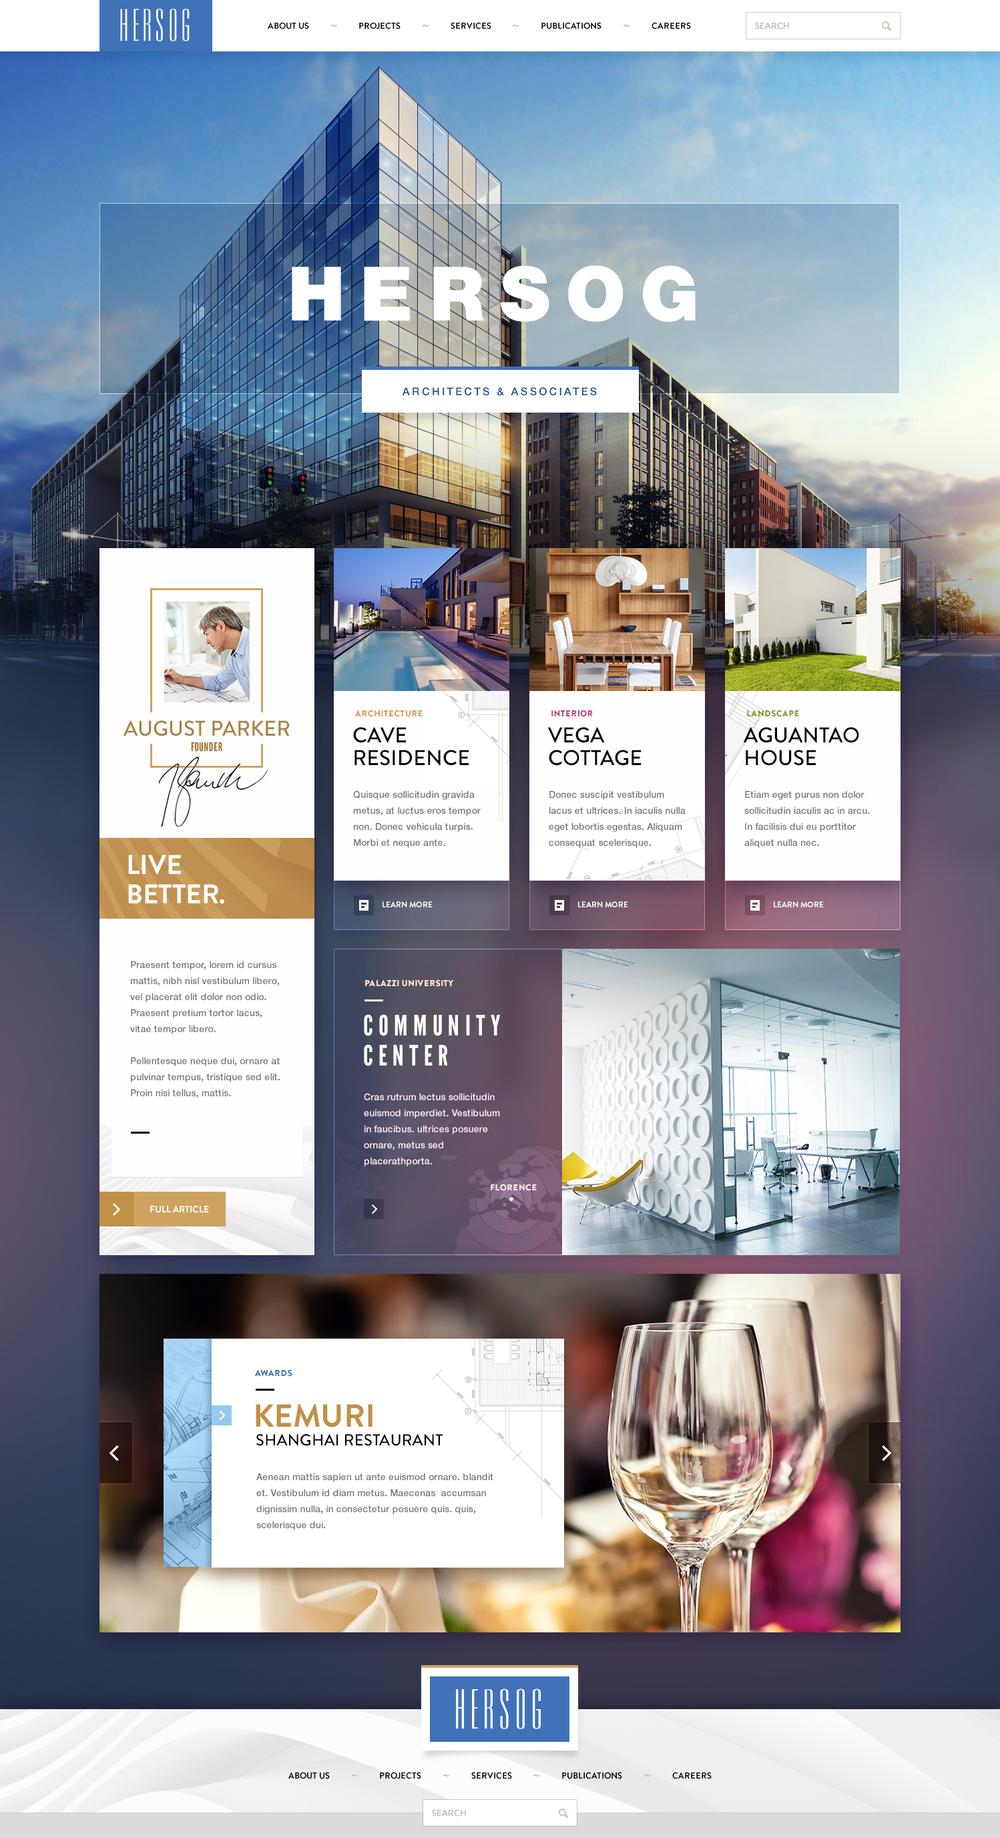 client1.jpg